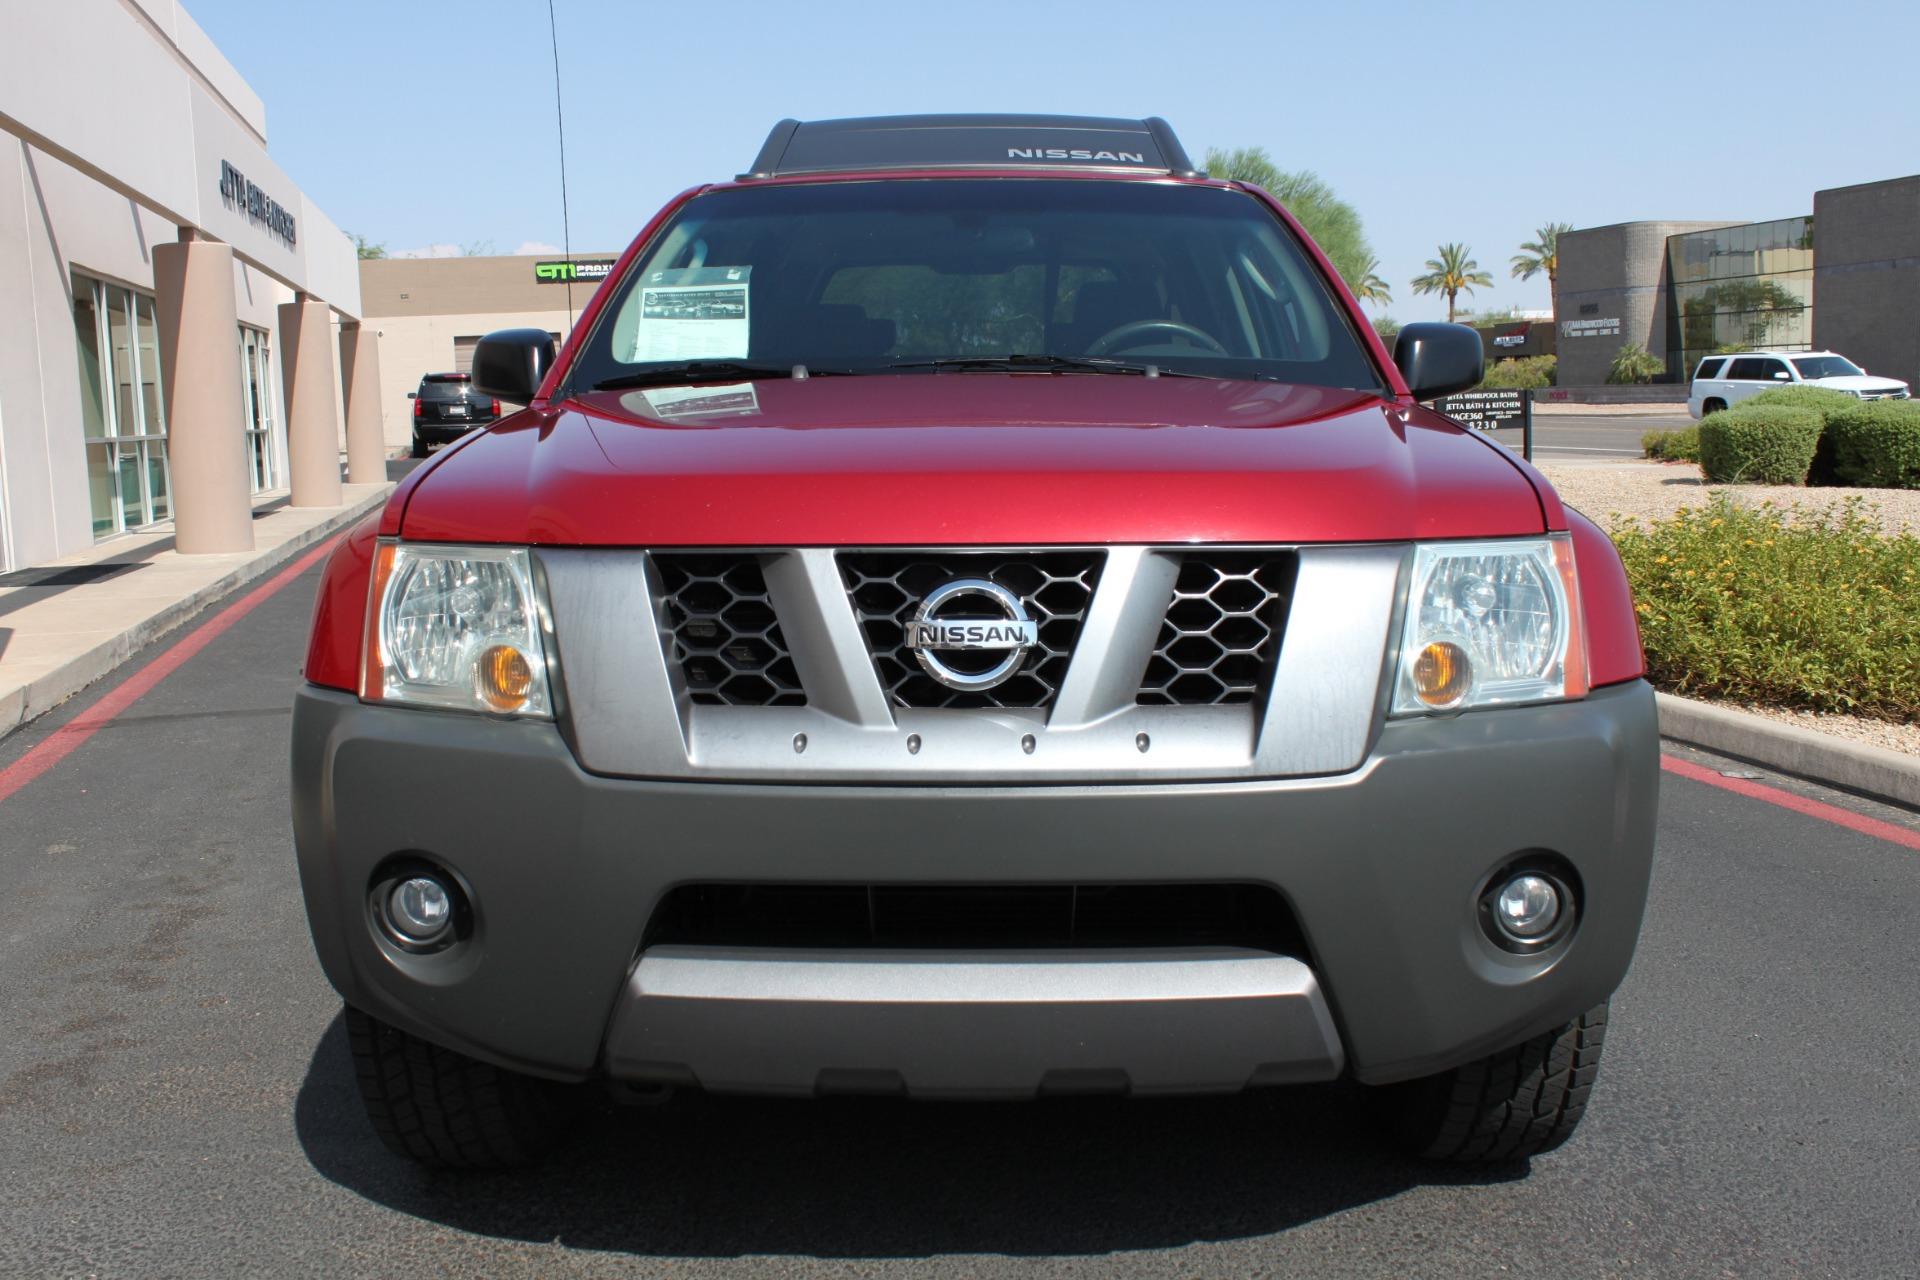 Used-2006-Nissan-Xterra-Off-Road-Wrangler